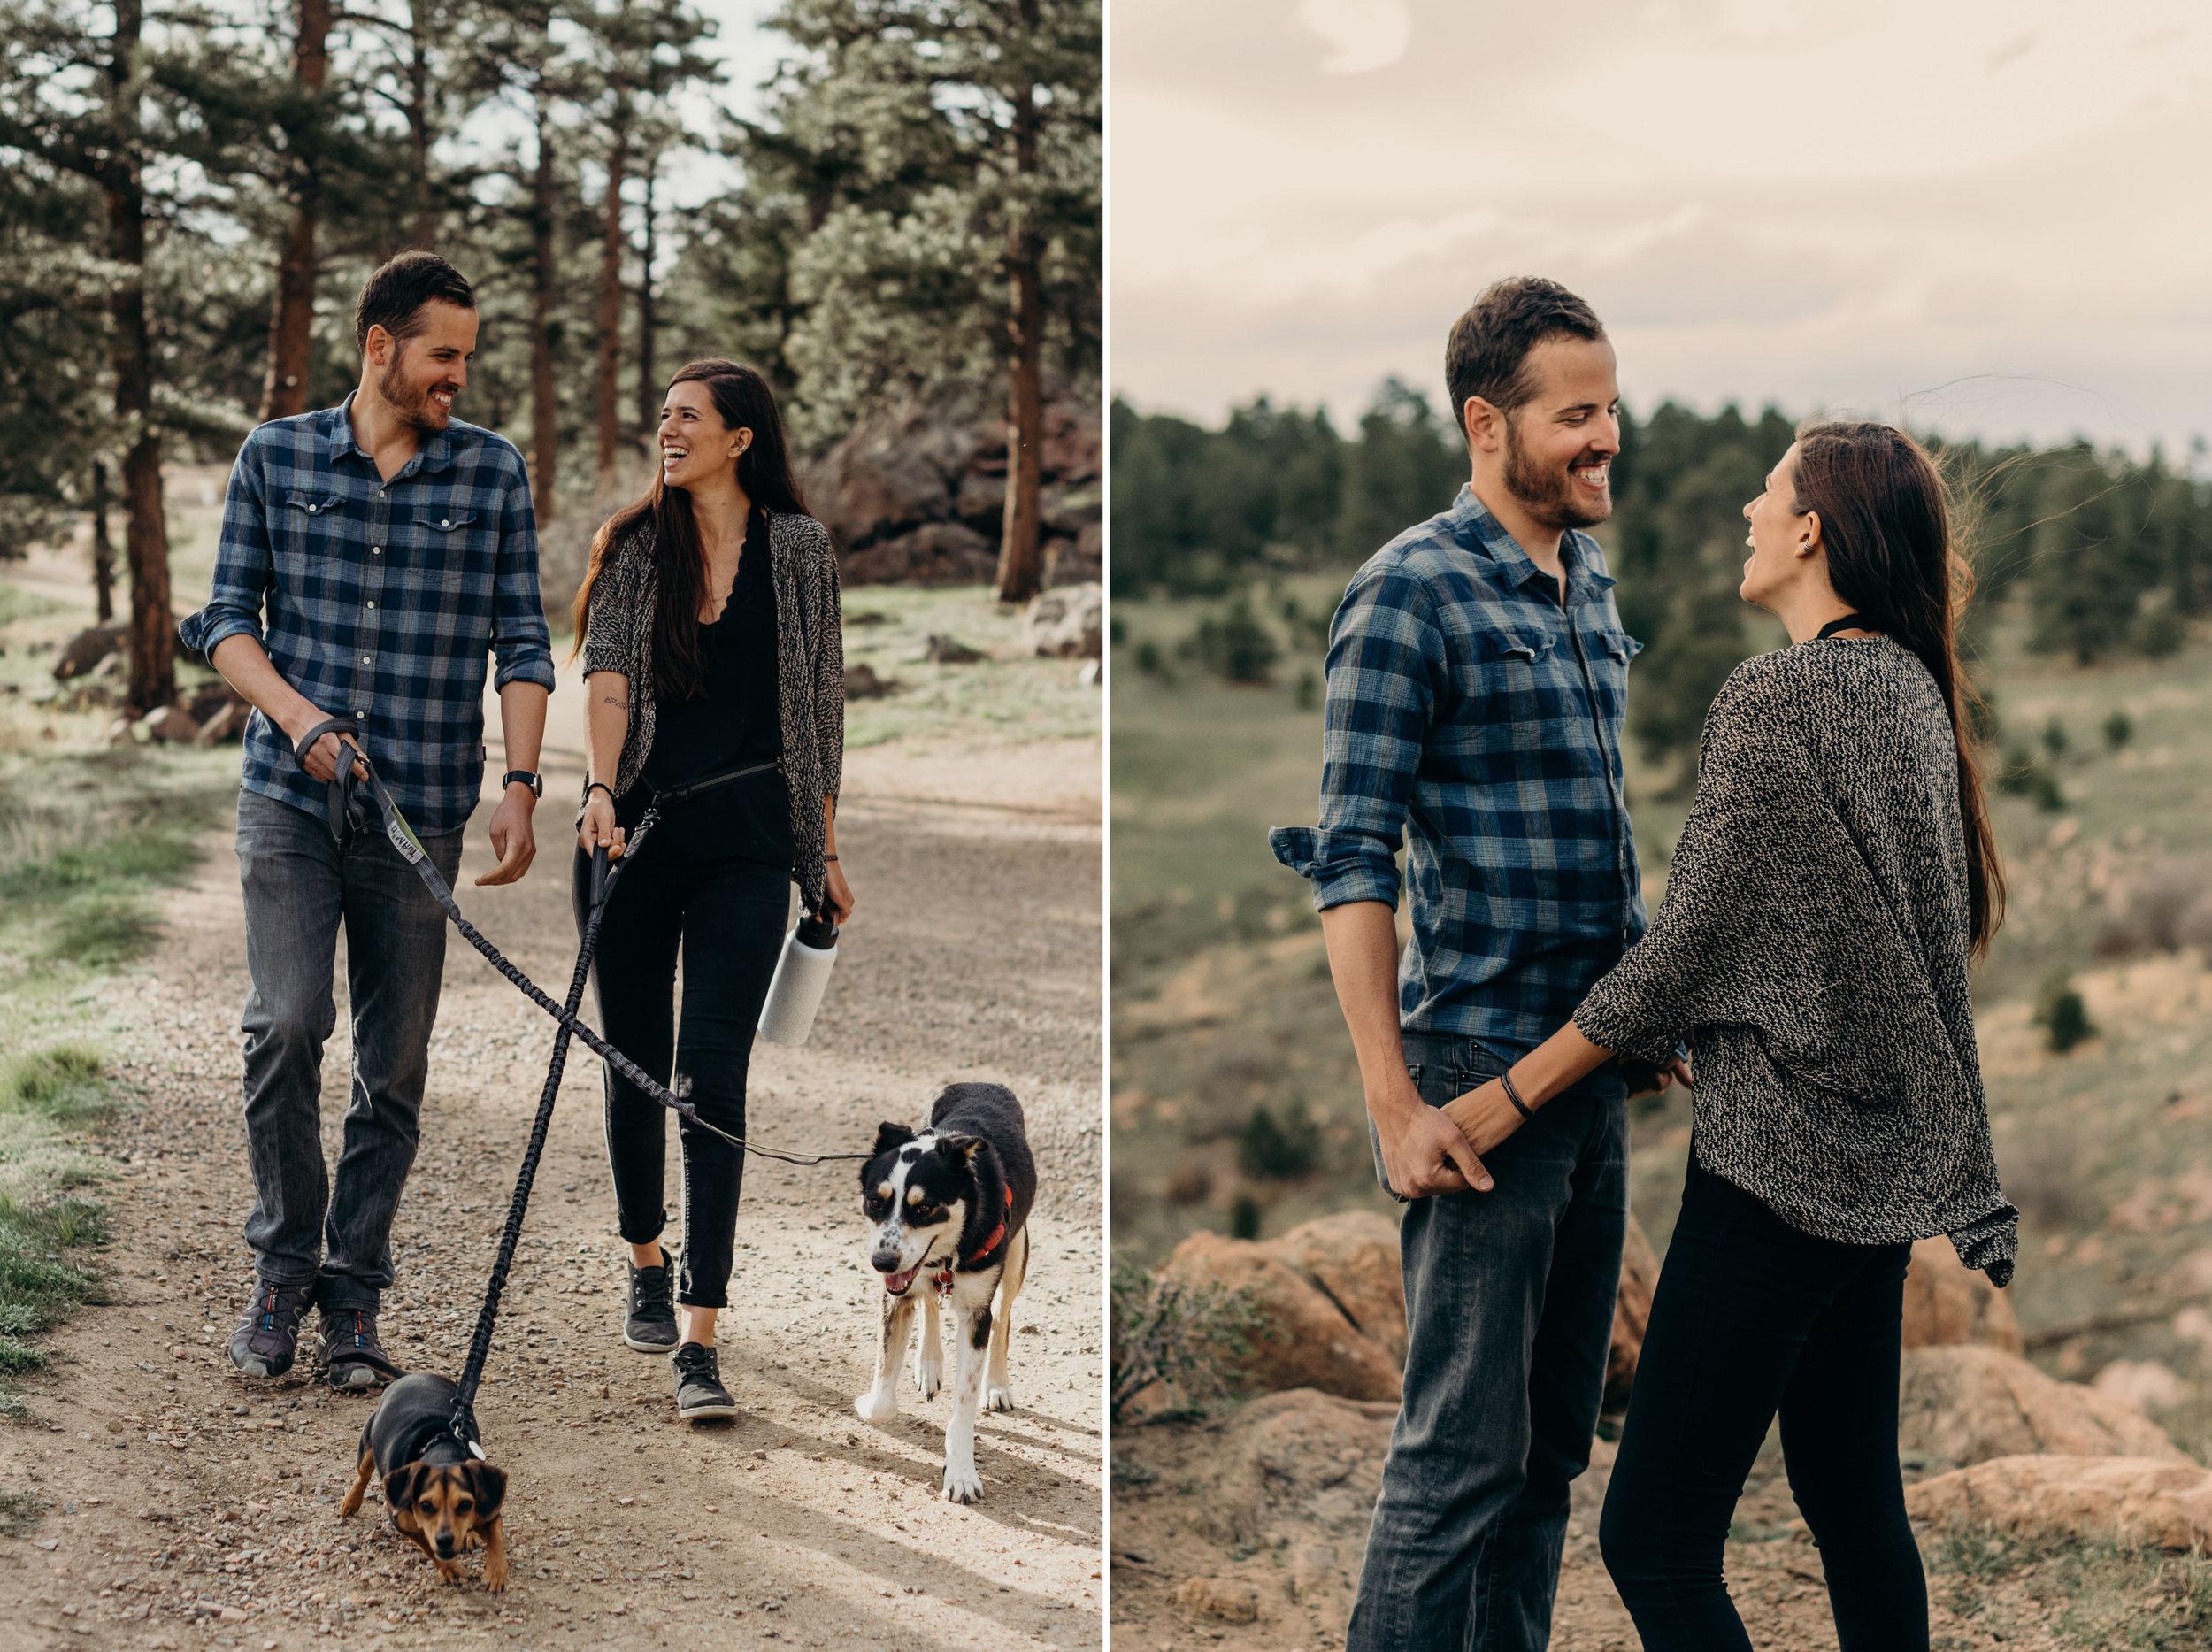 Denver-Colorado-Mt-Falcon-Engagement-Megan-Graham-Photography-1.jpg